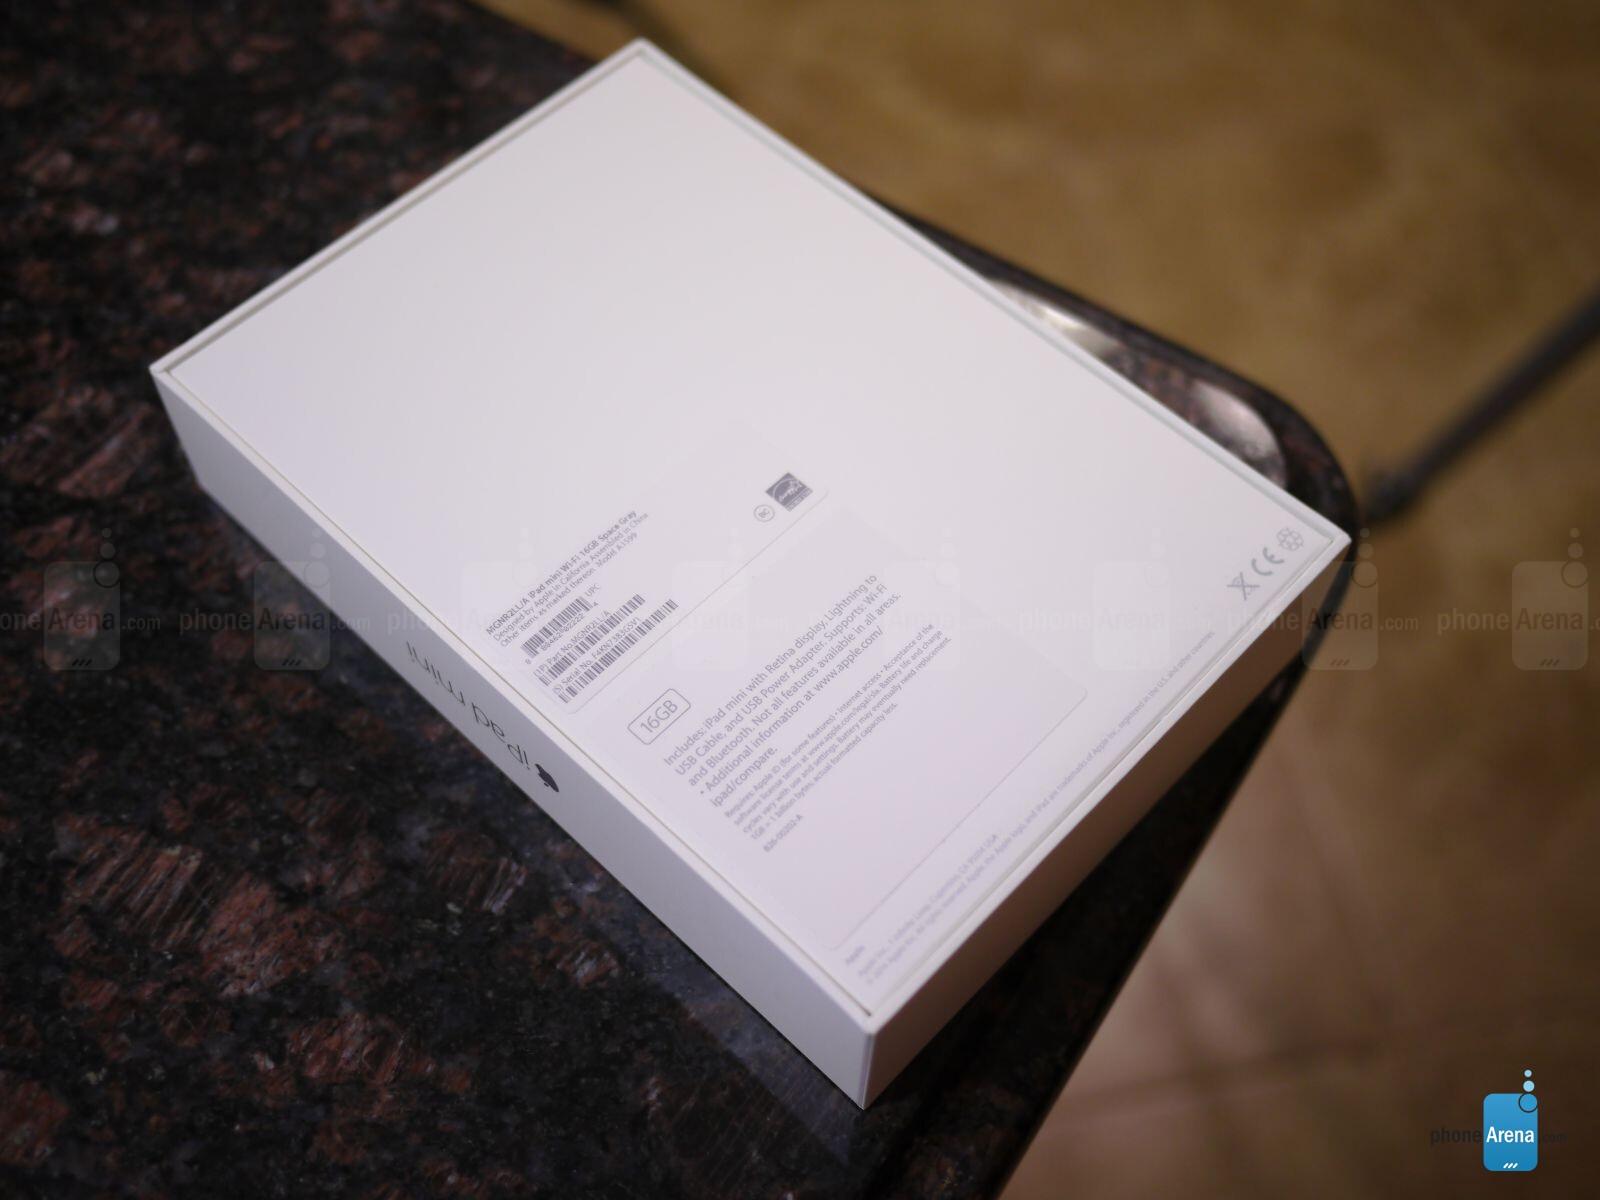 apple ipad mini instruction manual